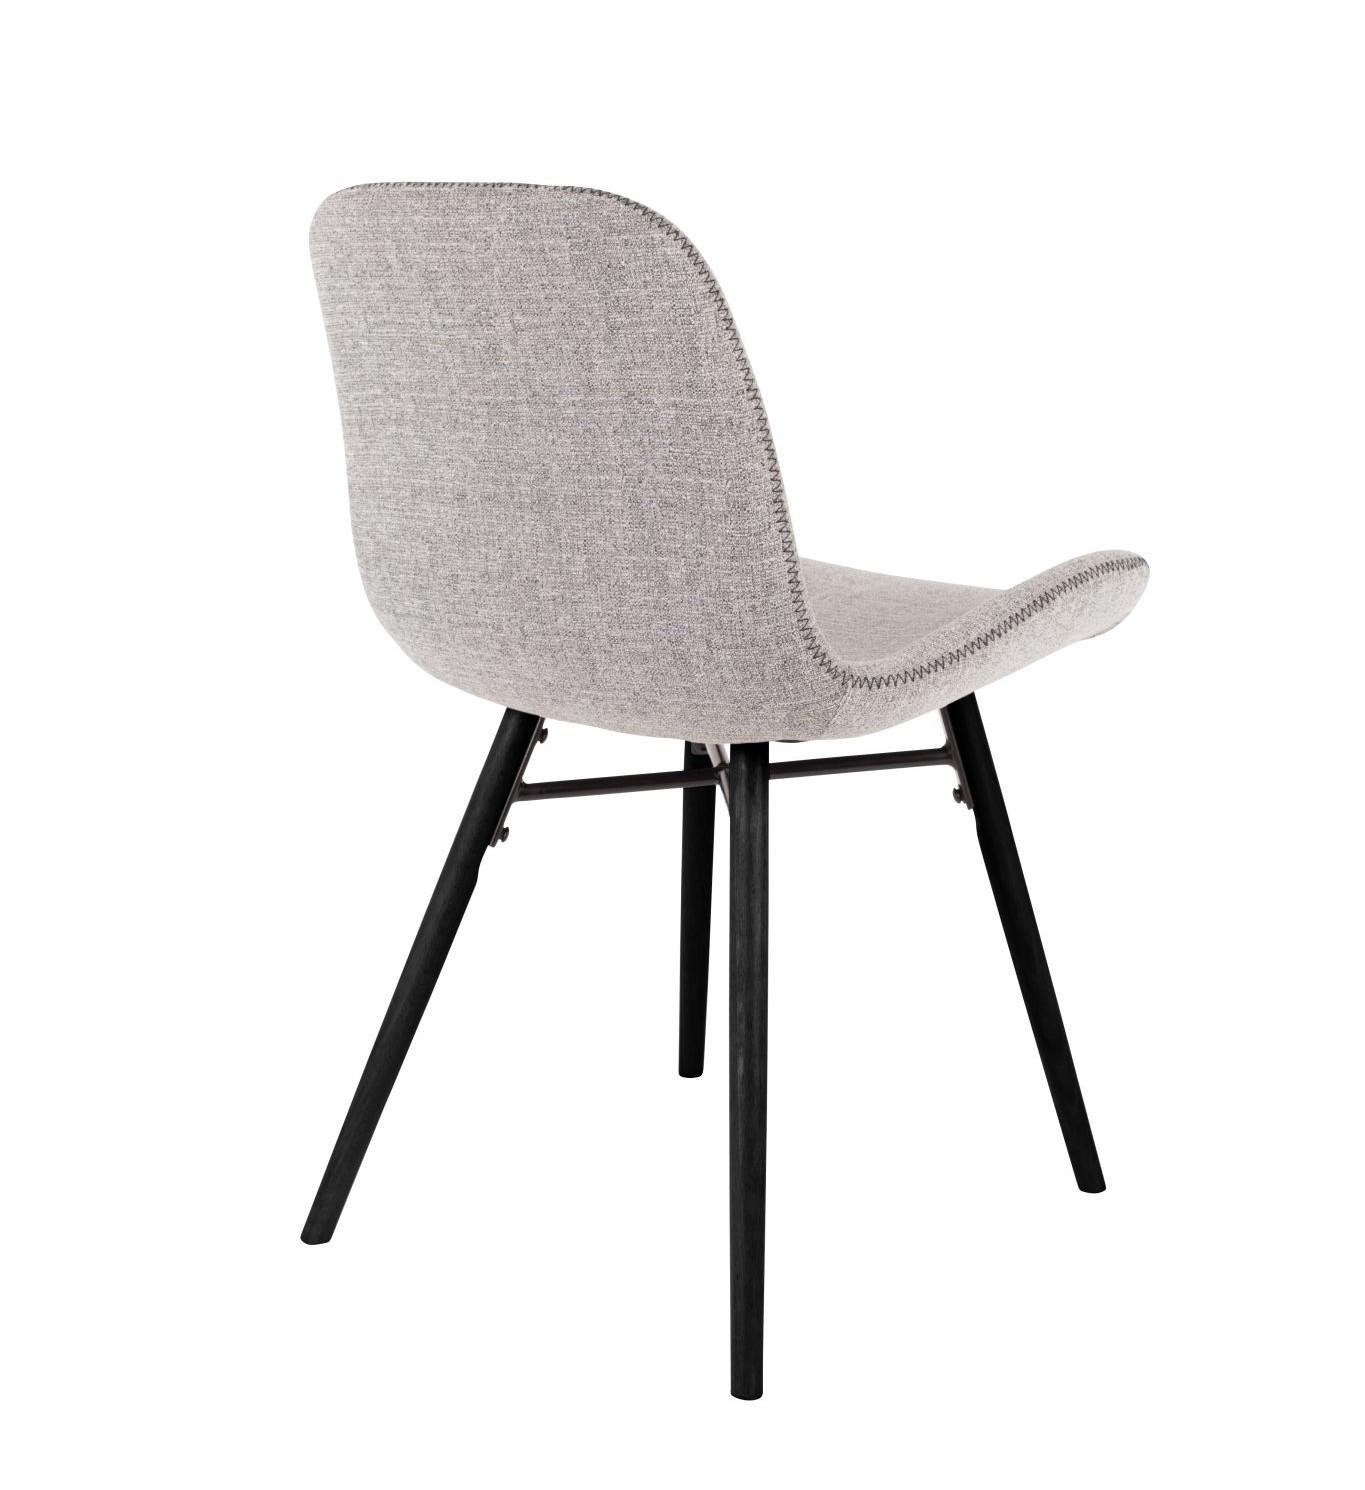 Chaise design de repas tissu gris clair